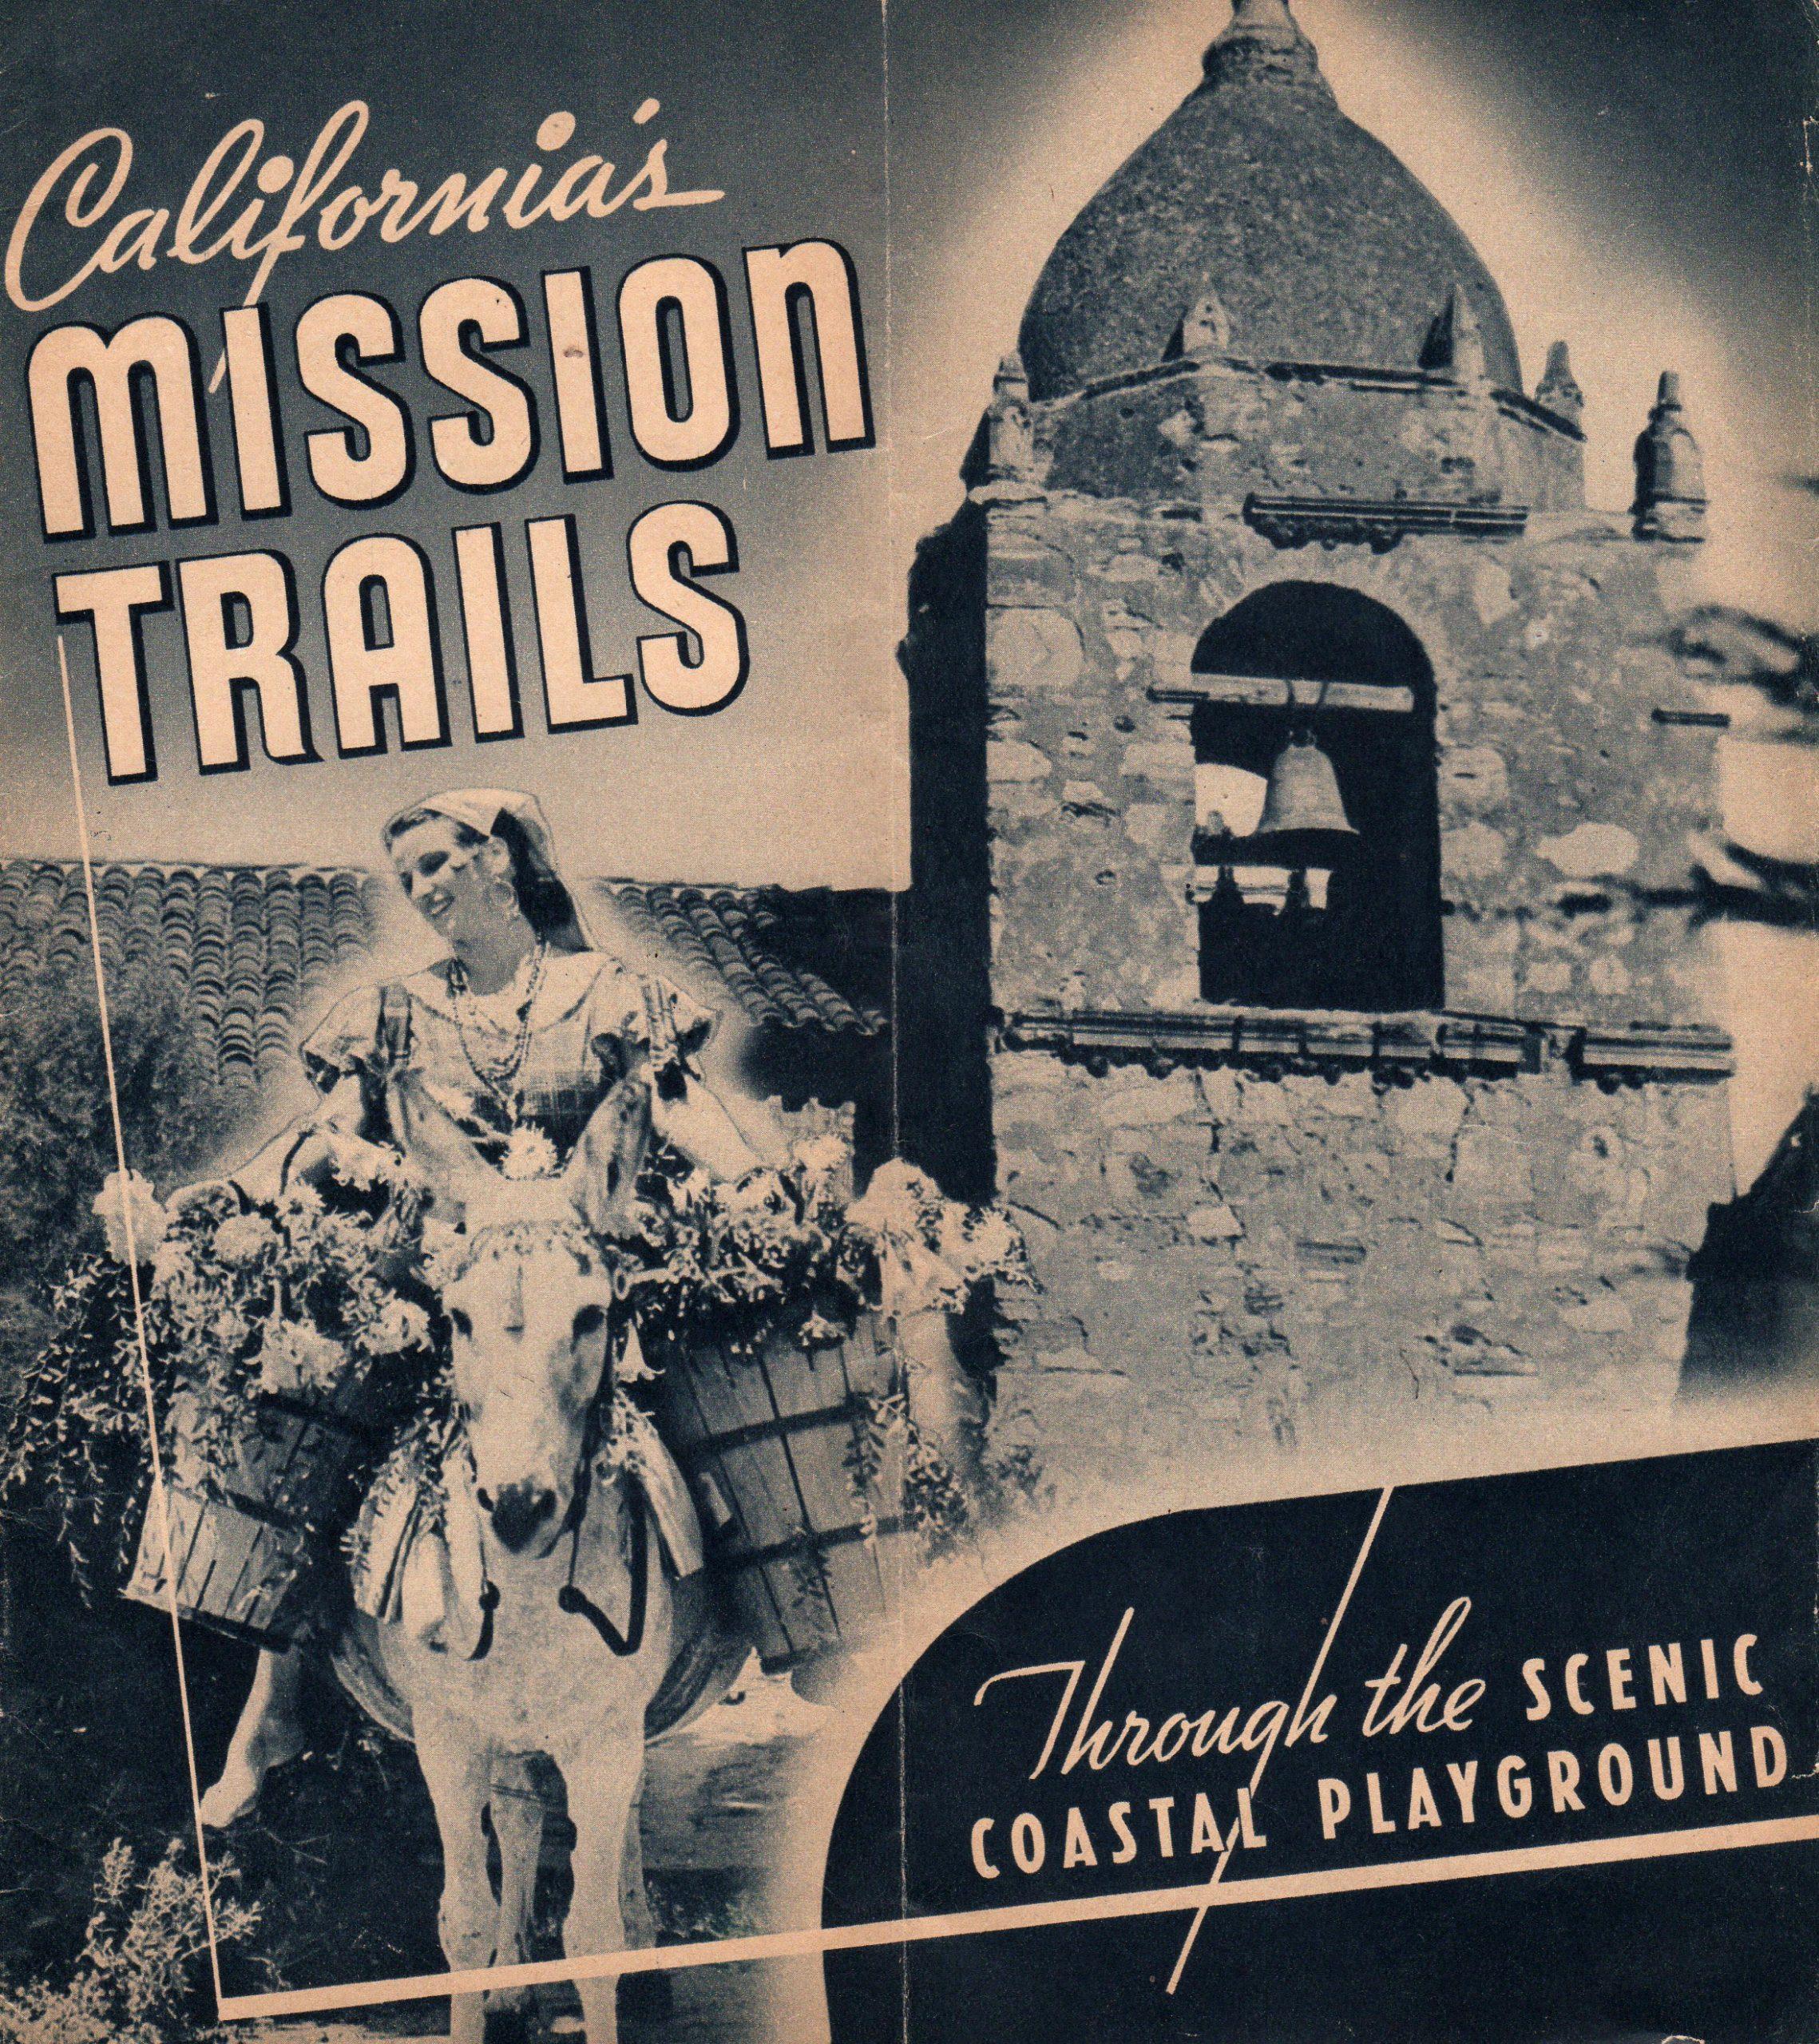 California Mission Trails Brochure